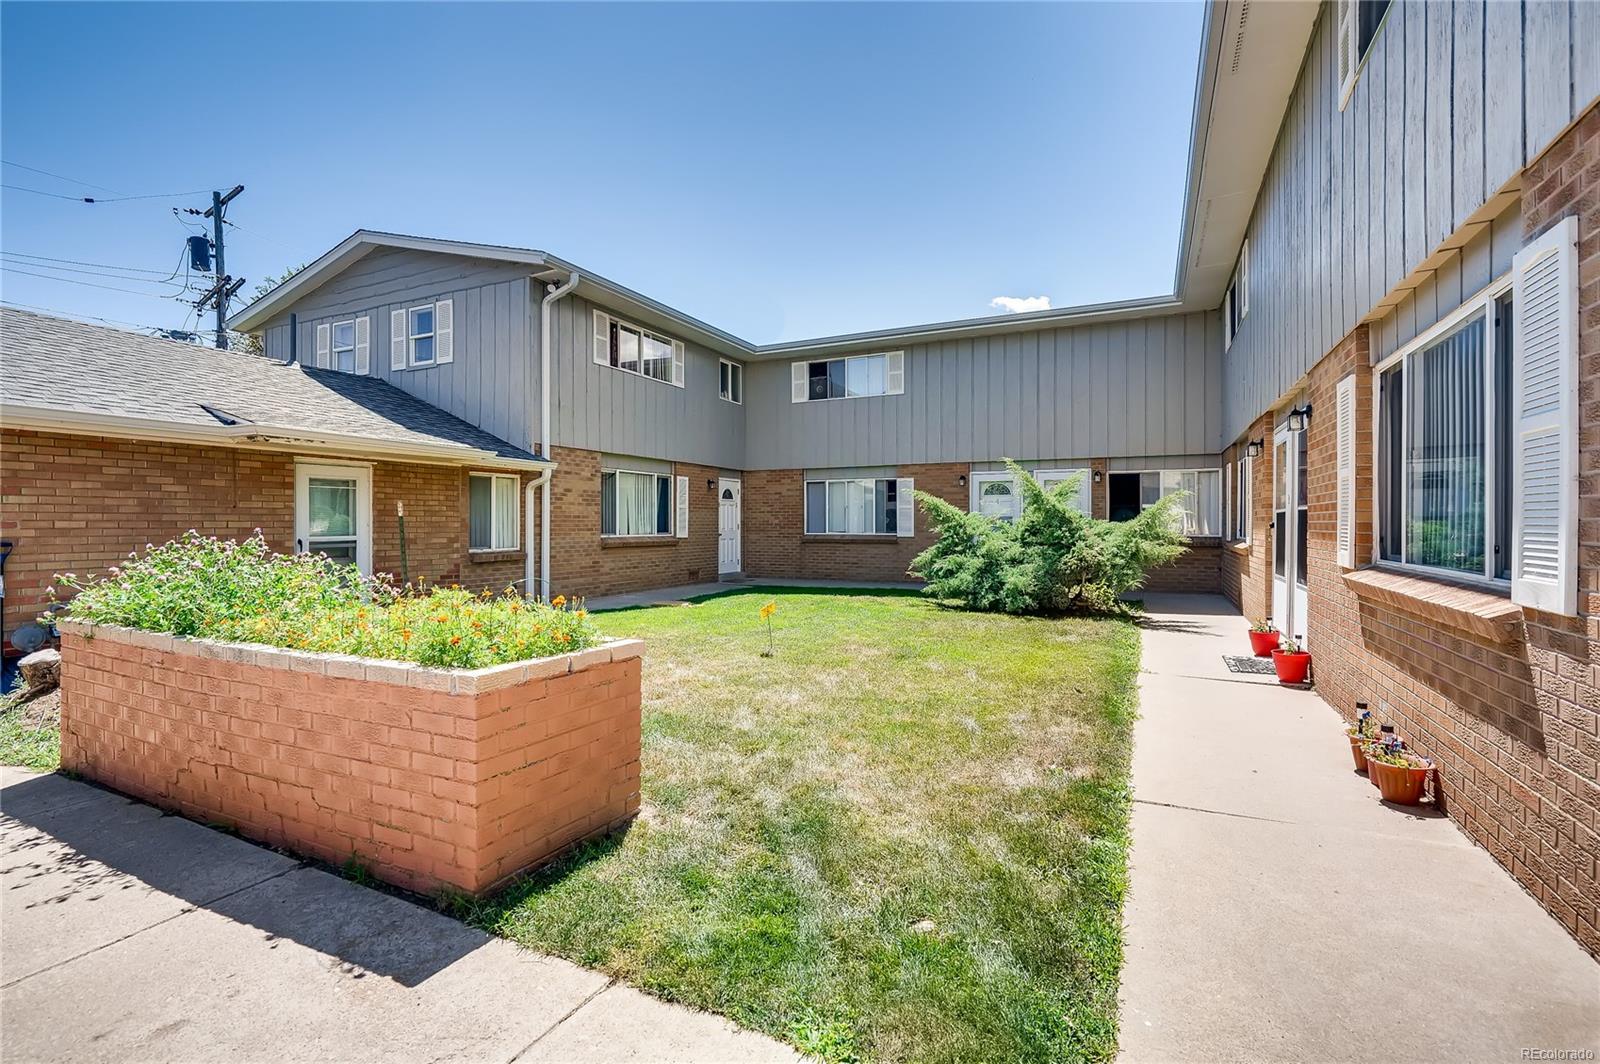 10900 W 44th Place, Wheat Ridge, CO 80033 - Wheat Ridge, CO real estate listing